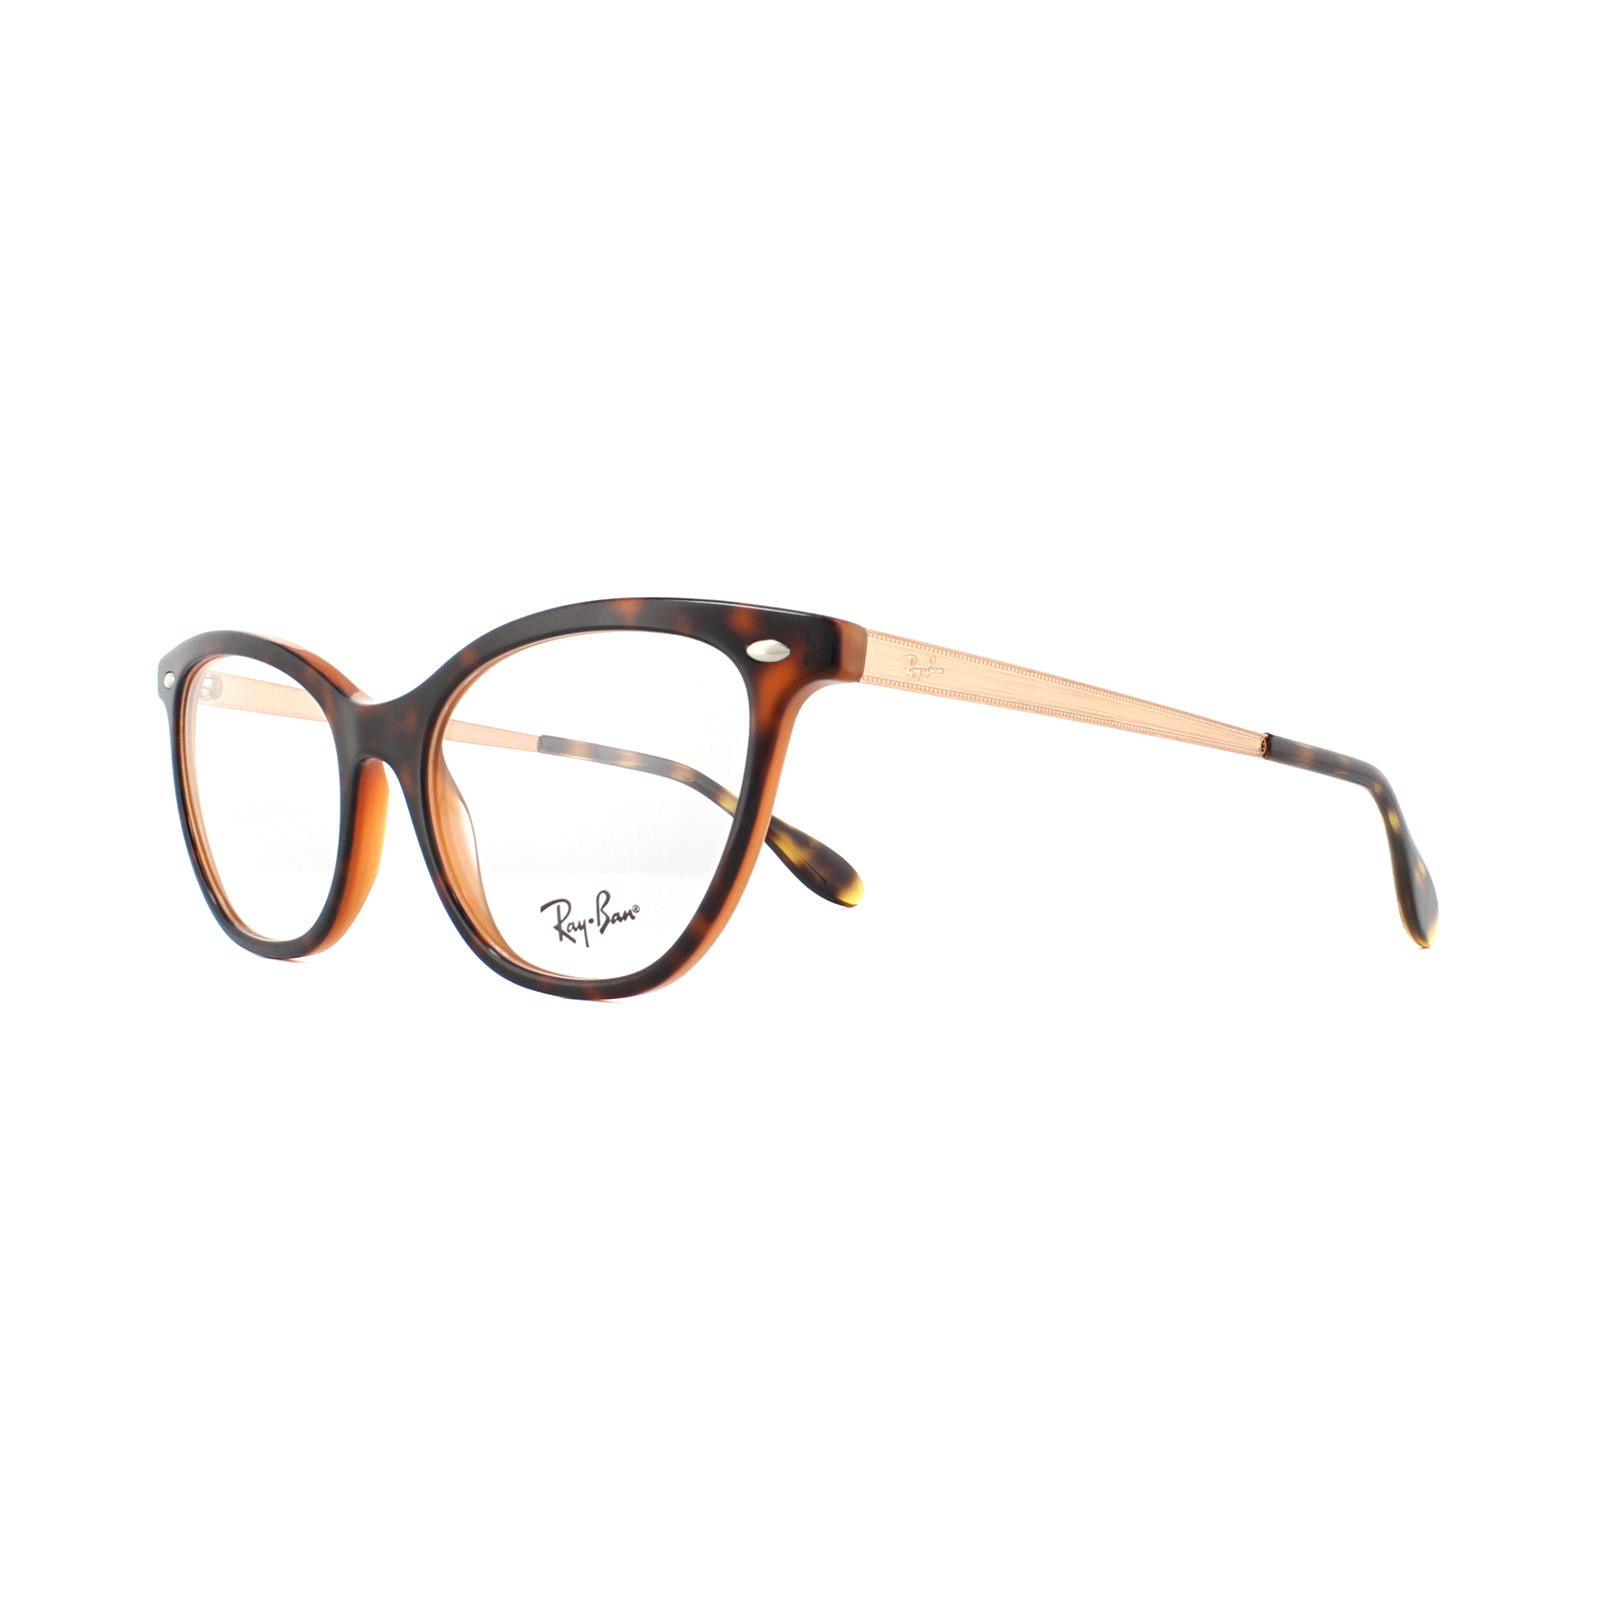 177ff14418 Sentinel Ray-Ban Glasses Frames 5360 5713 Top Havana On Light Blue 52mm